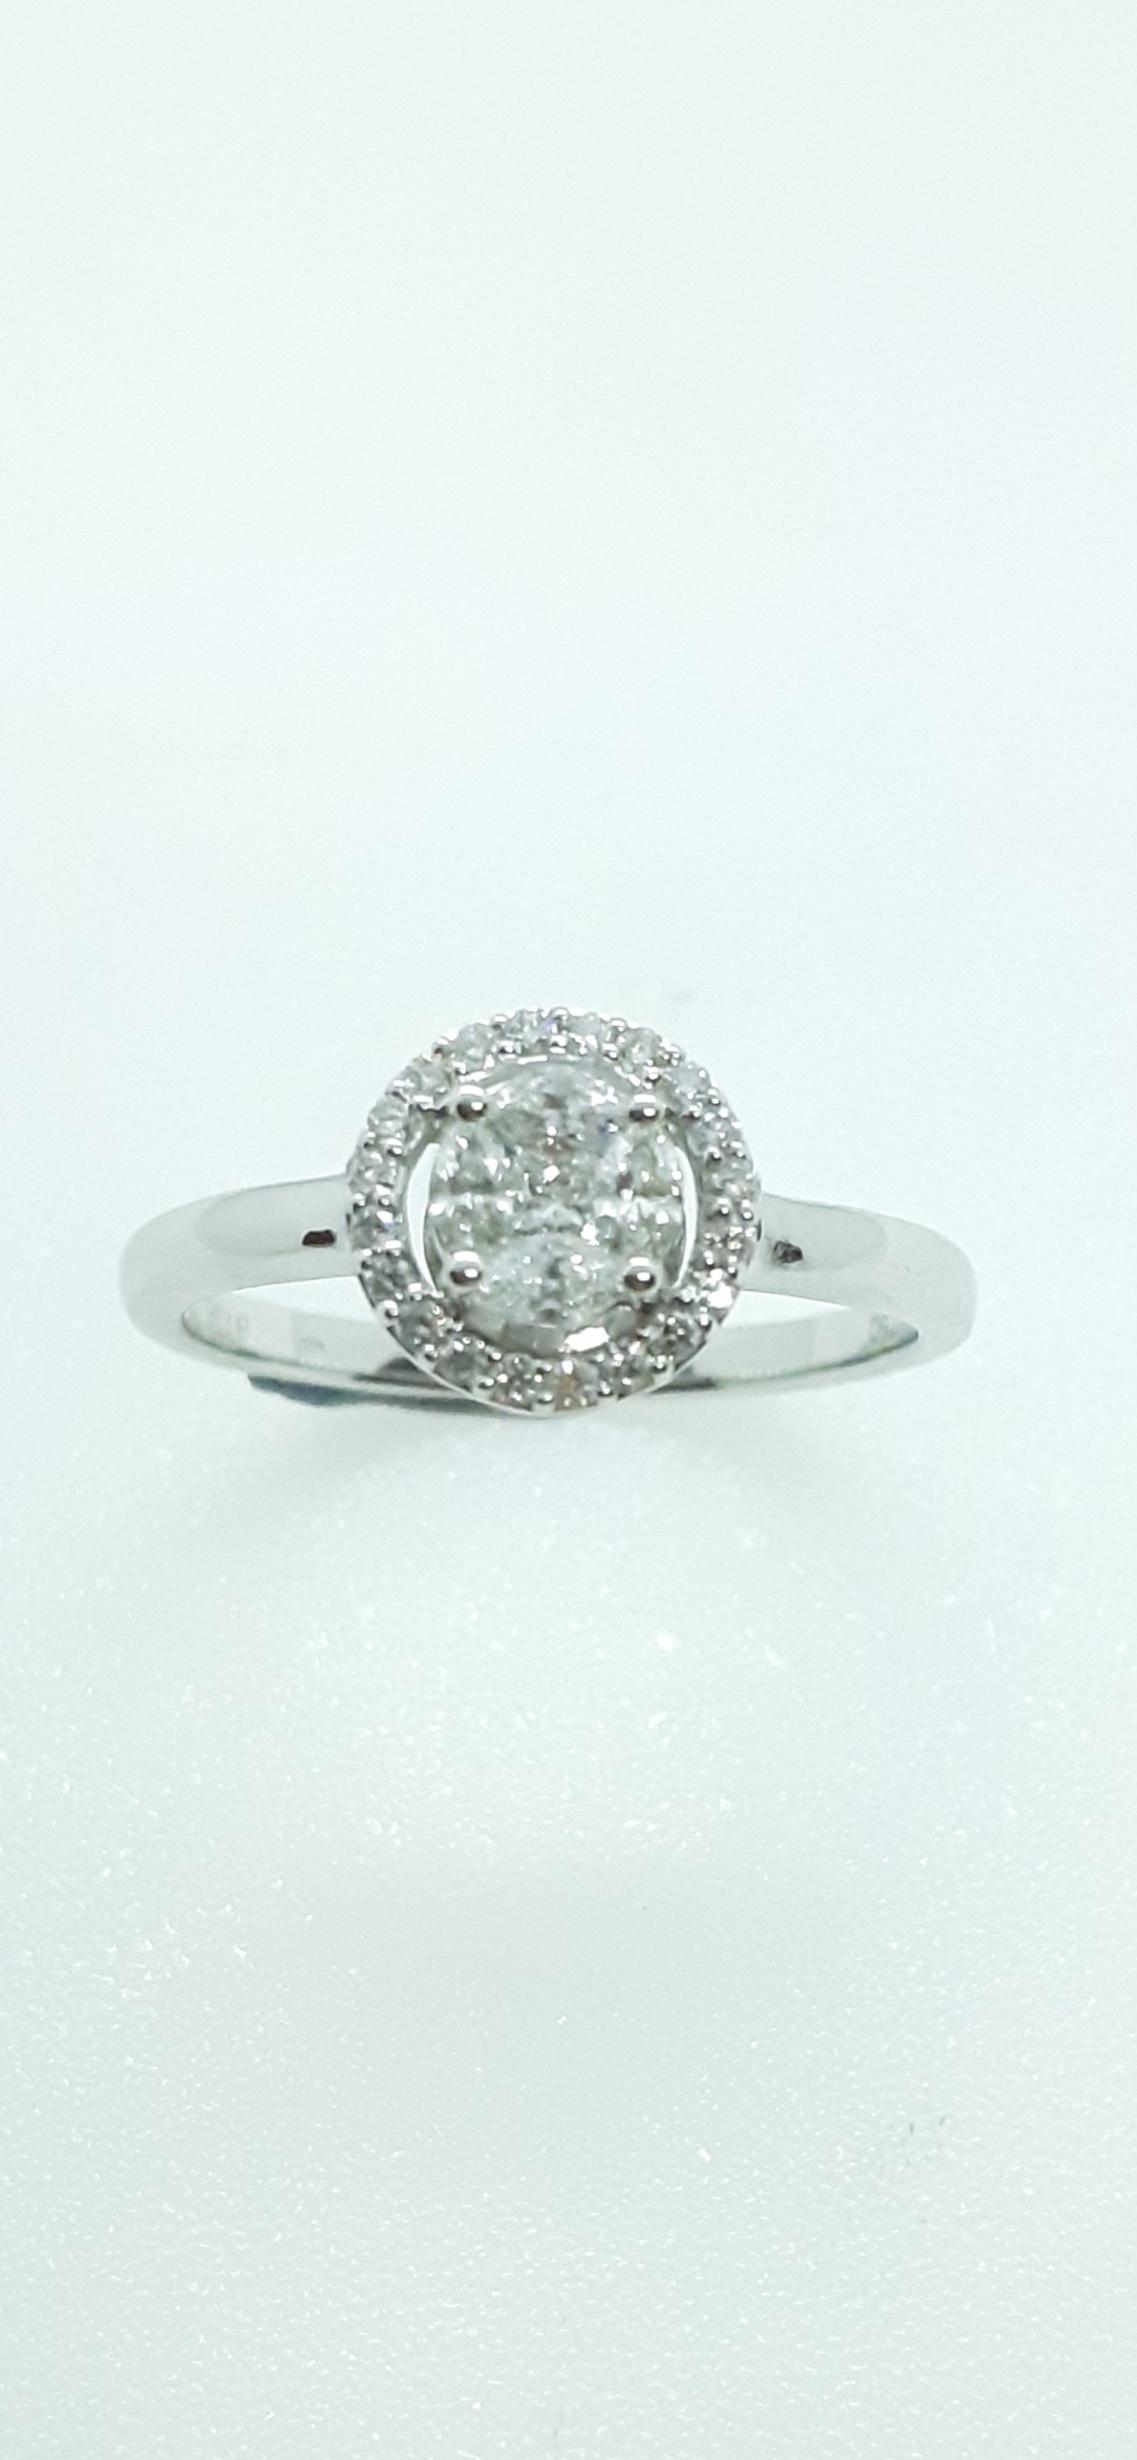 Sensi joyas alta joyería Granada plata compromiso SORTIJA ORO 18K BRILLANTES  0,30 CTS